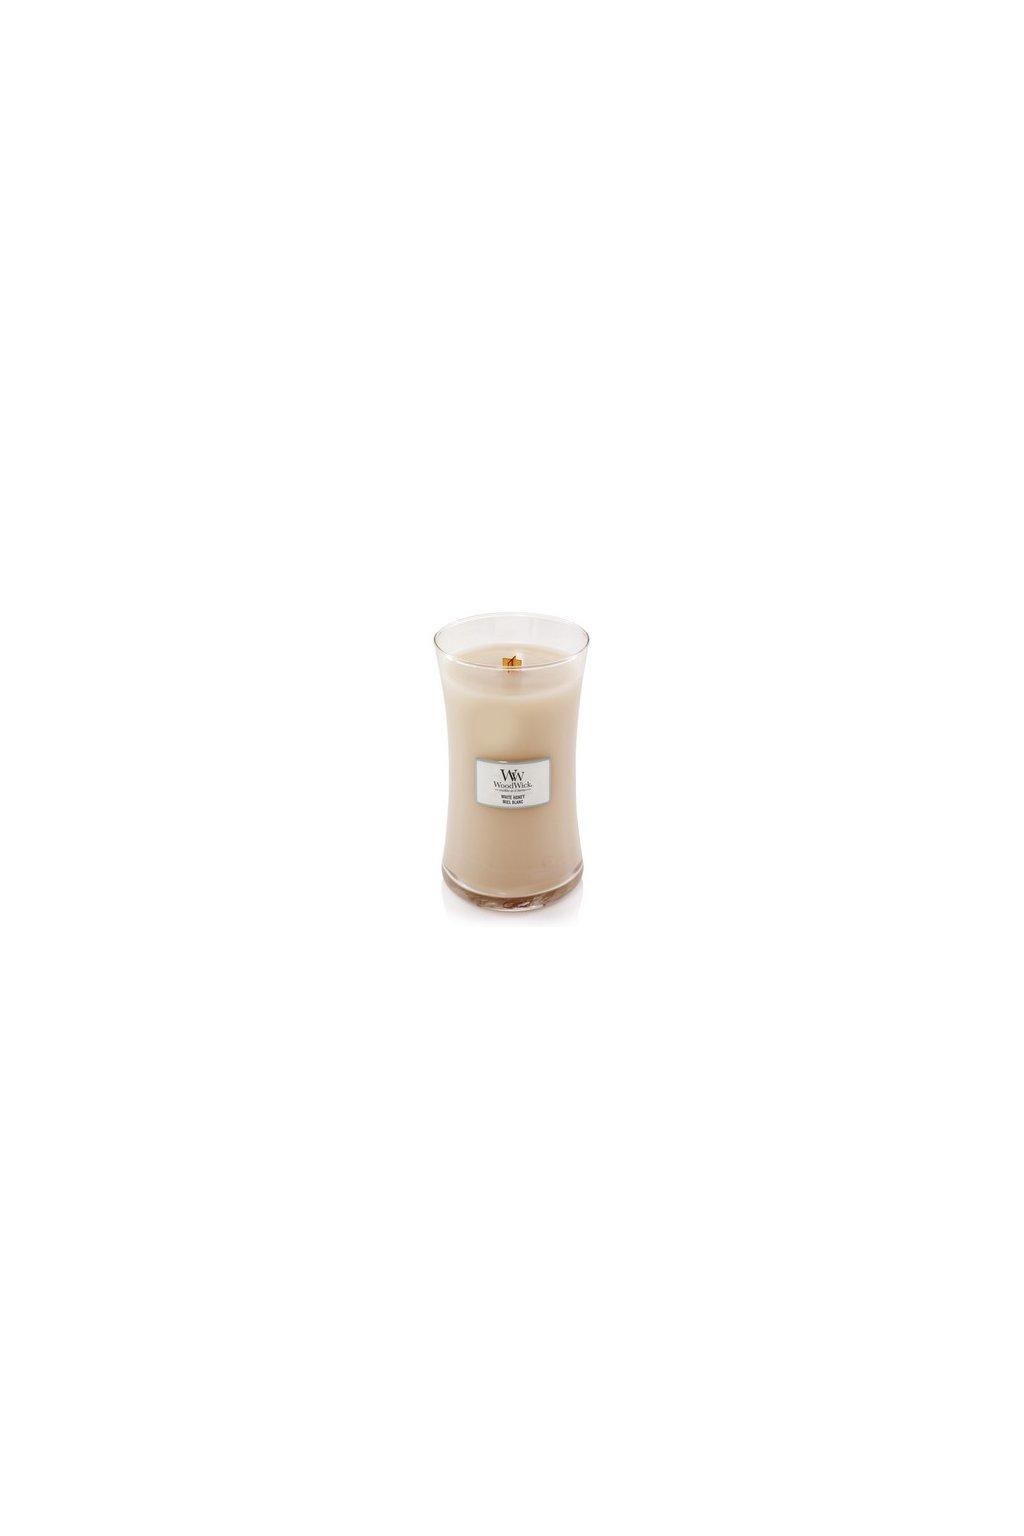 WoodWick White Honey 609g